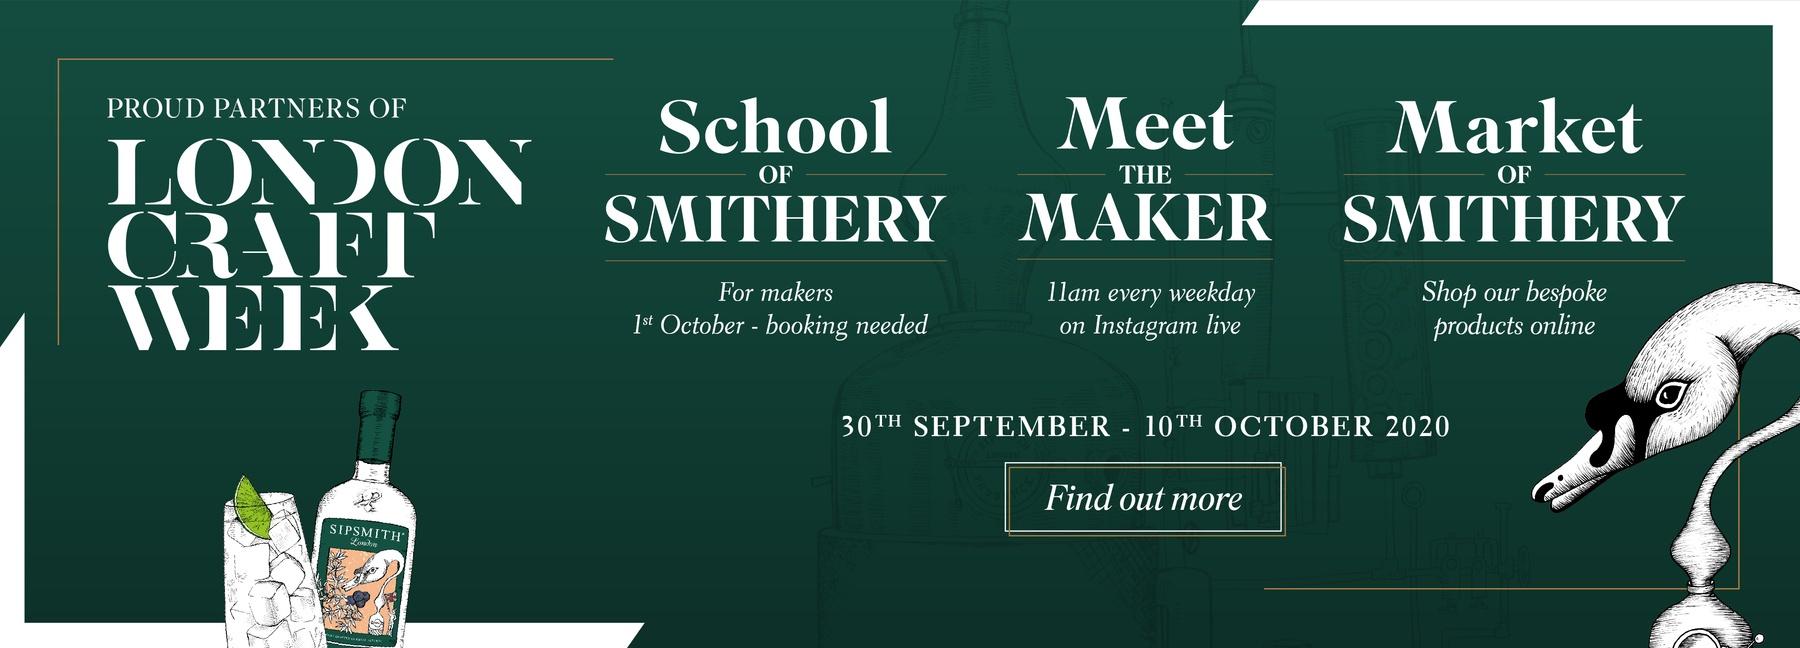 Sipsmith x London Craft Week